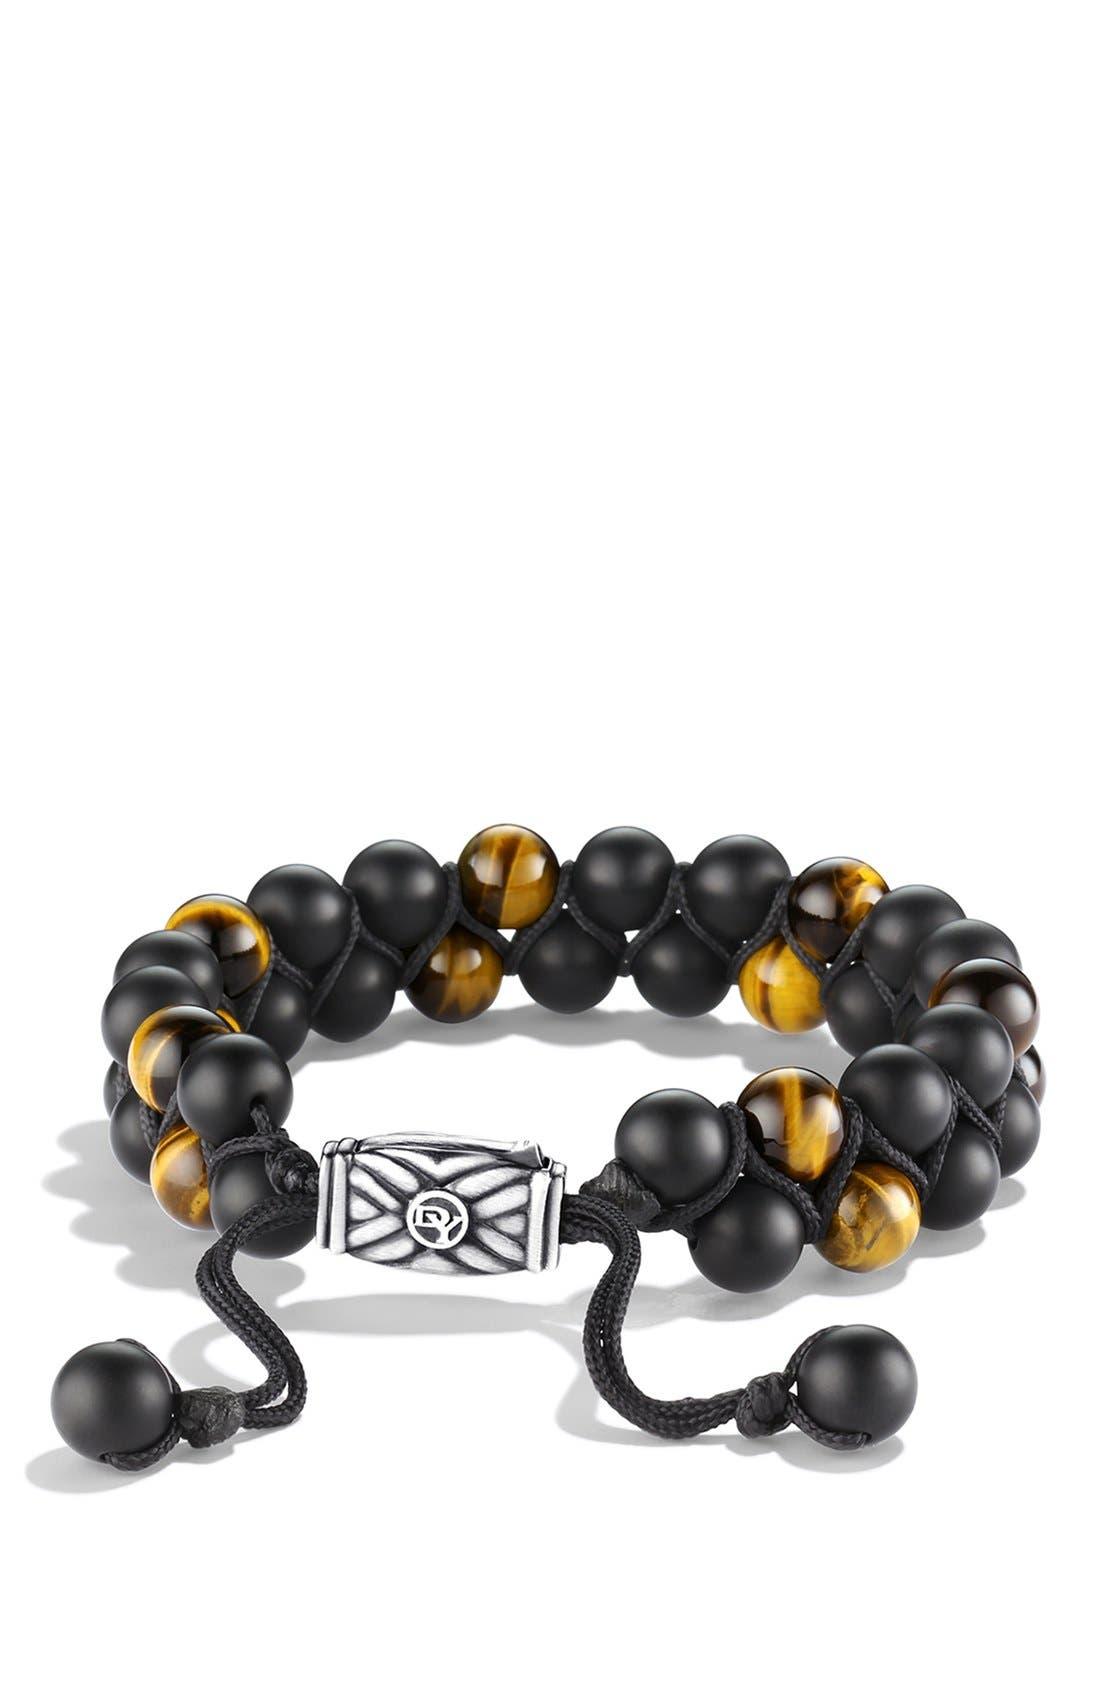 Main Image - David Yurman 'Spiritual Beads' Two-Row Stone Bracelet